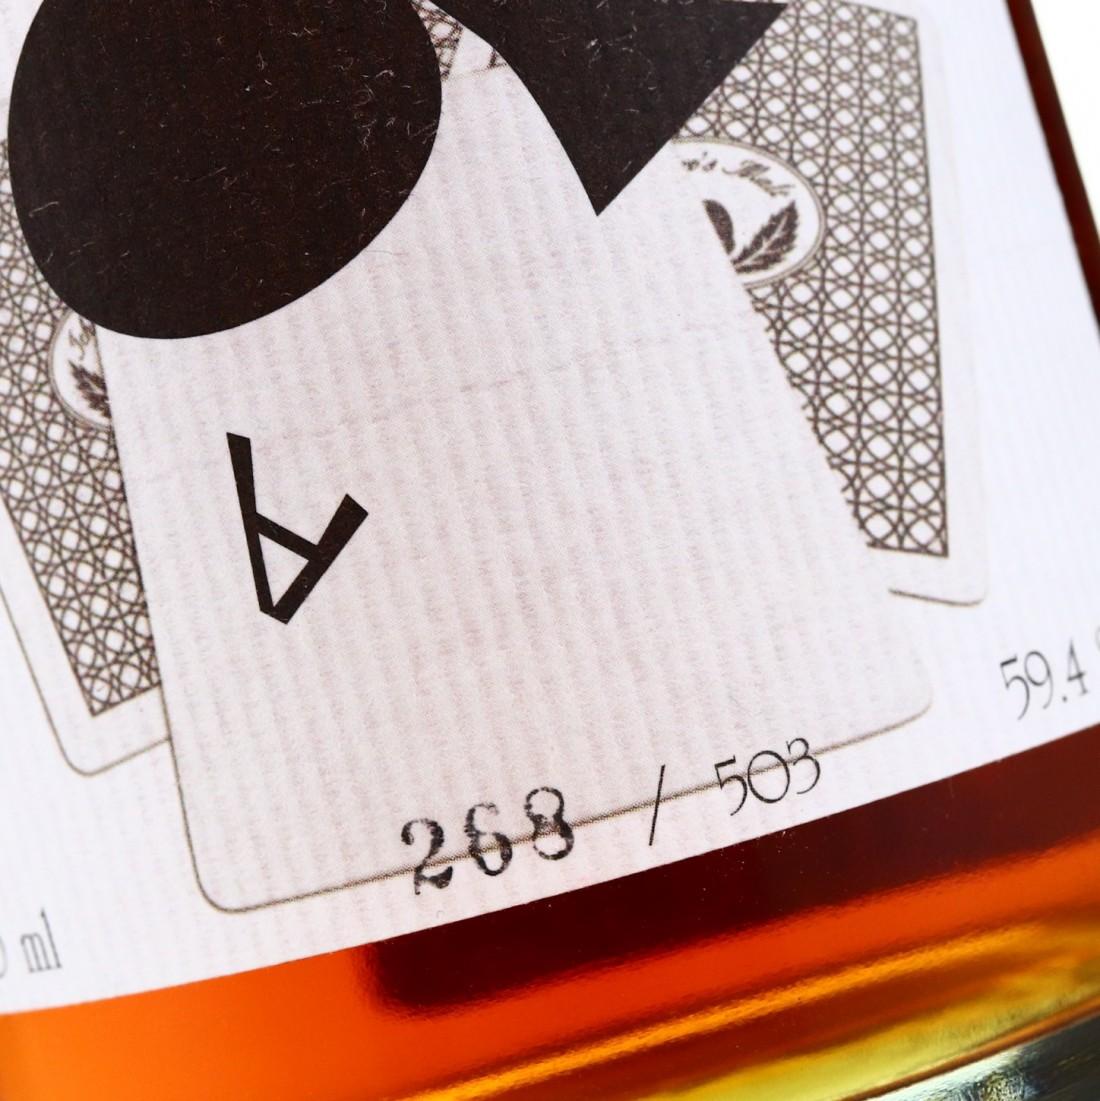 Hanyu 2000 Ichiro's Malt 'Card' #9523 / Ace of Clubs